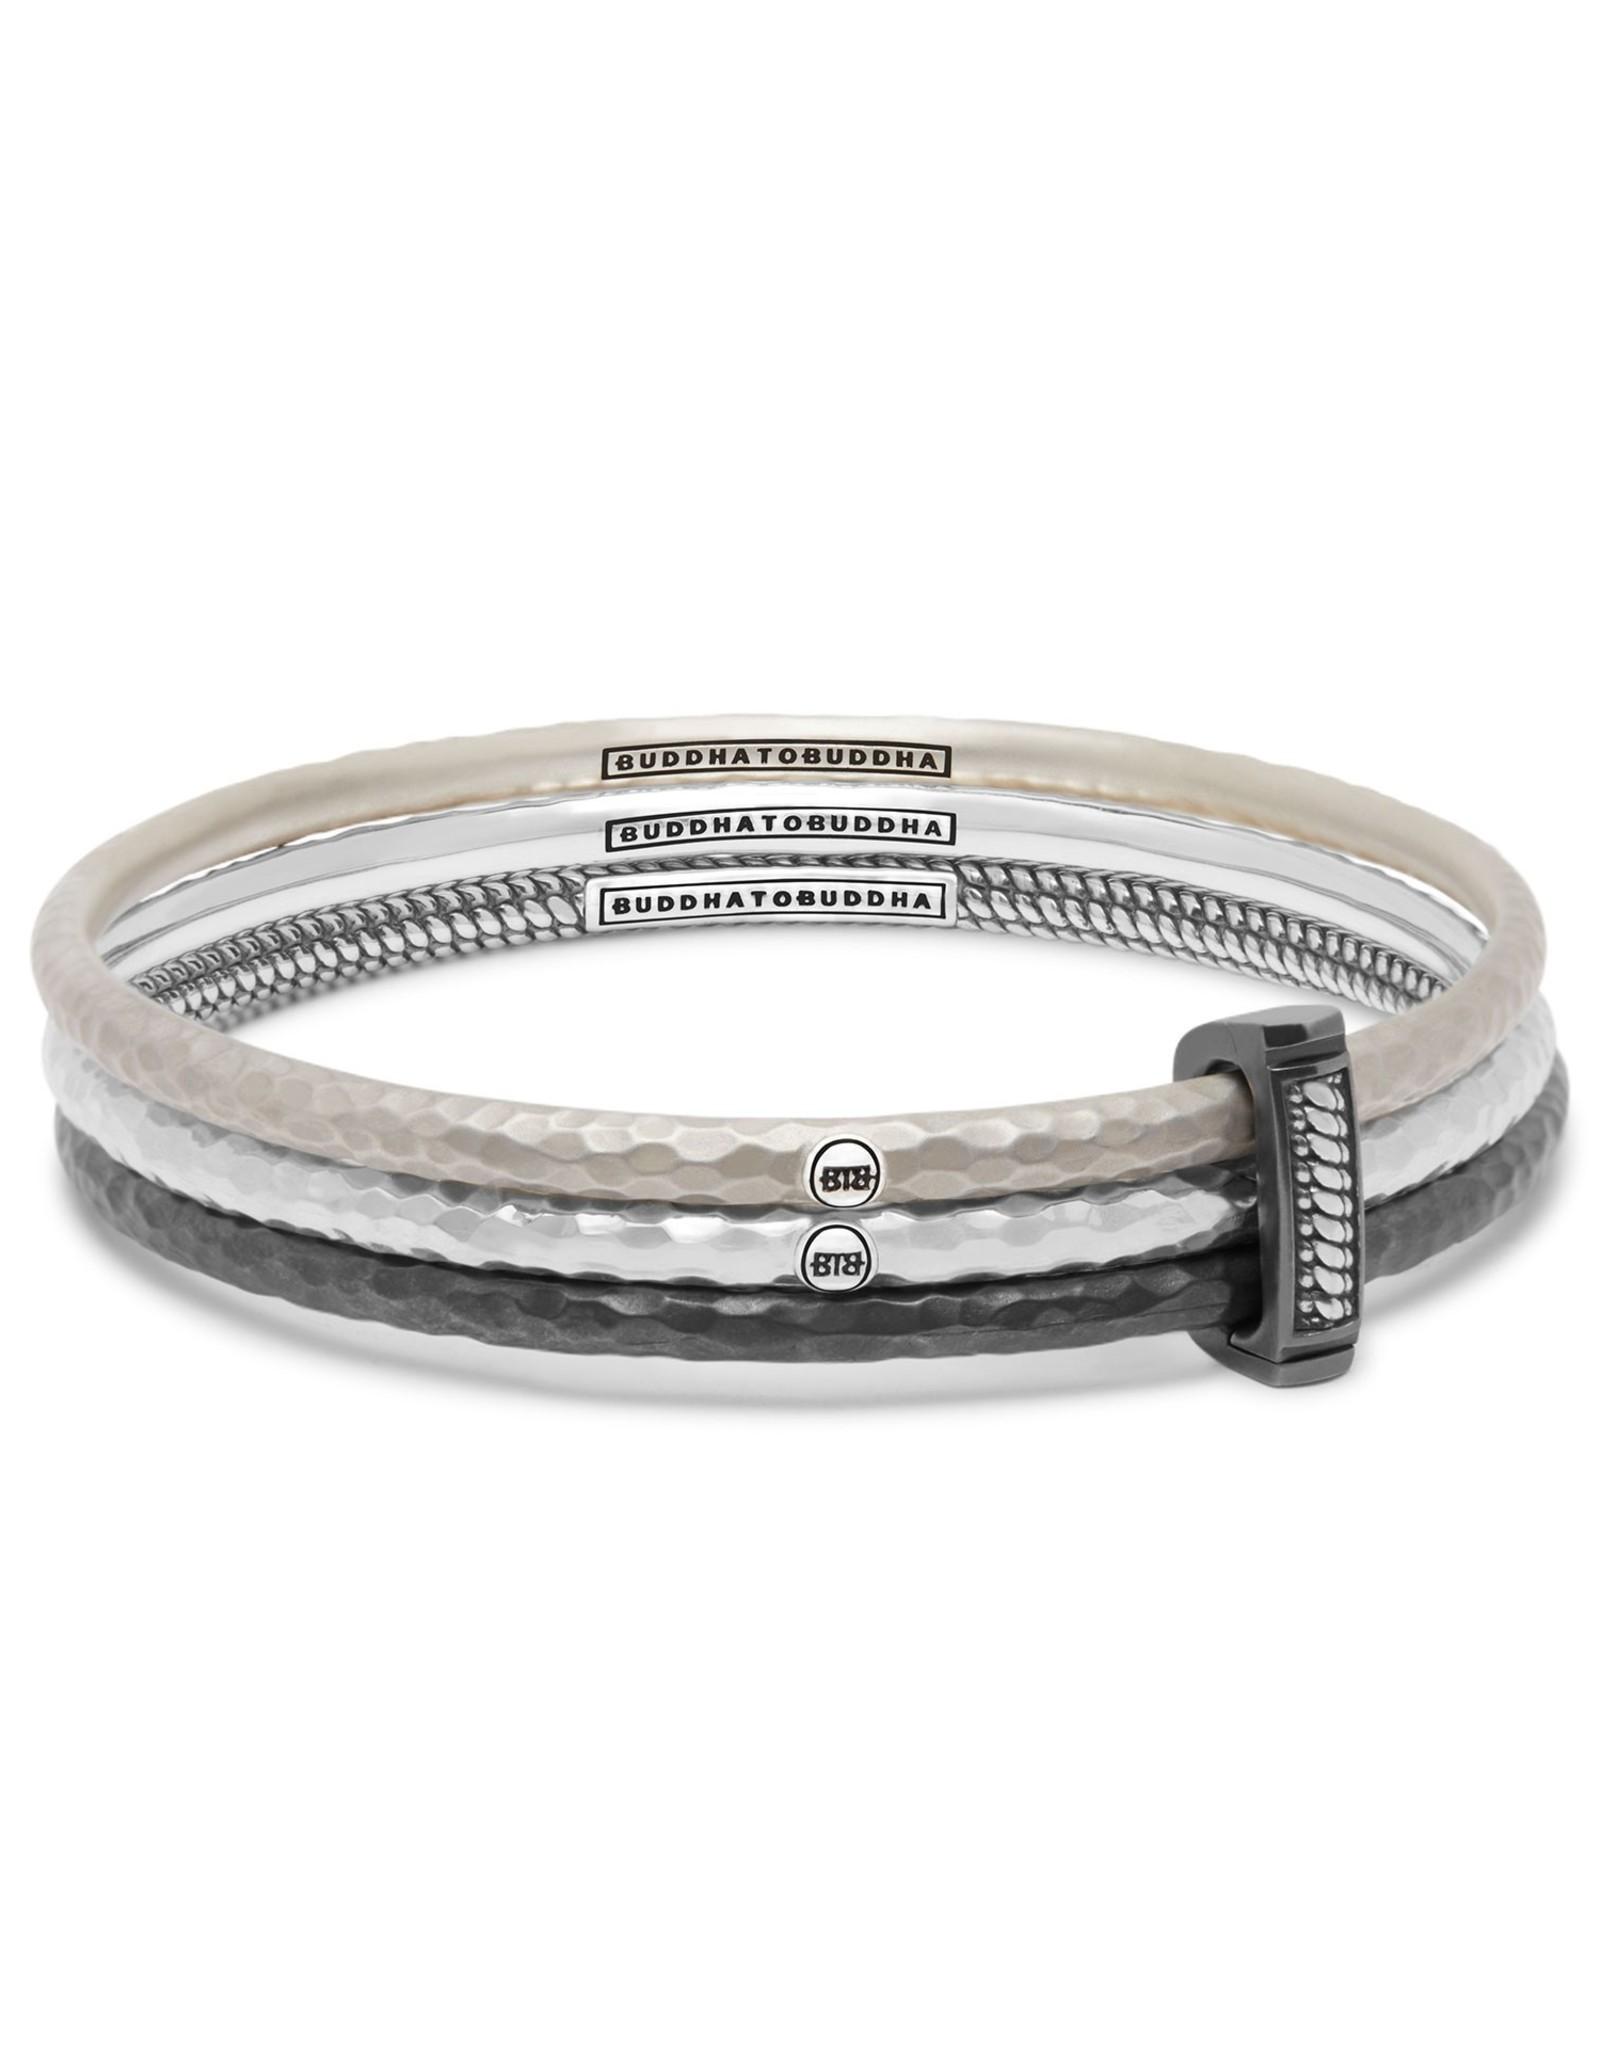 Buddha to Buddha 925 Sterling Zilveren 317 S Dunia Satu Bracelet Set  15-17cm